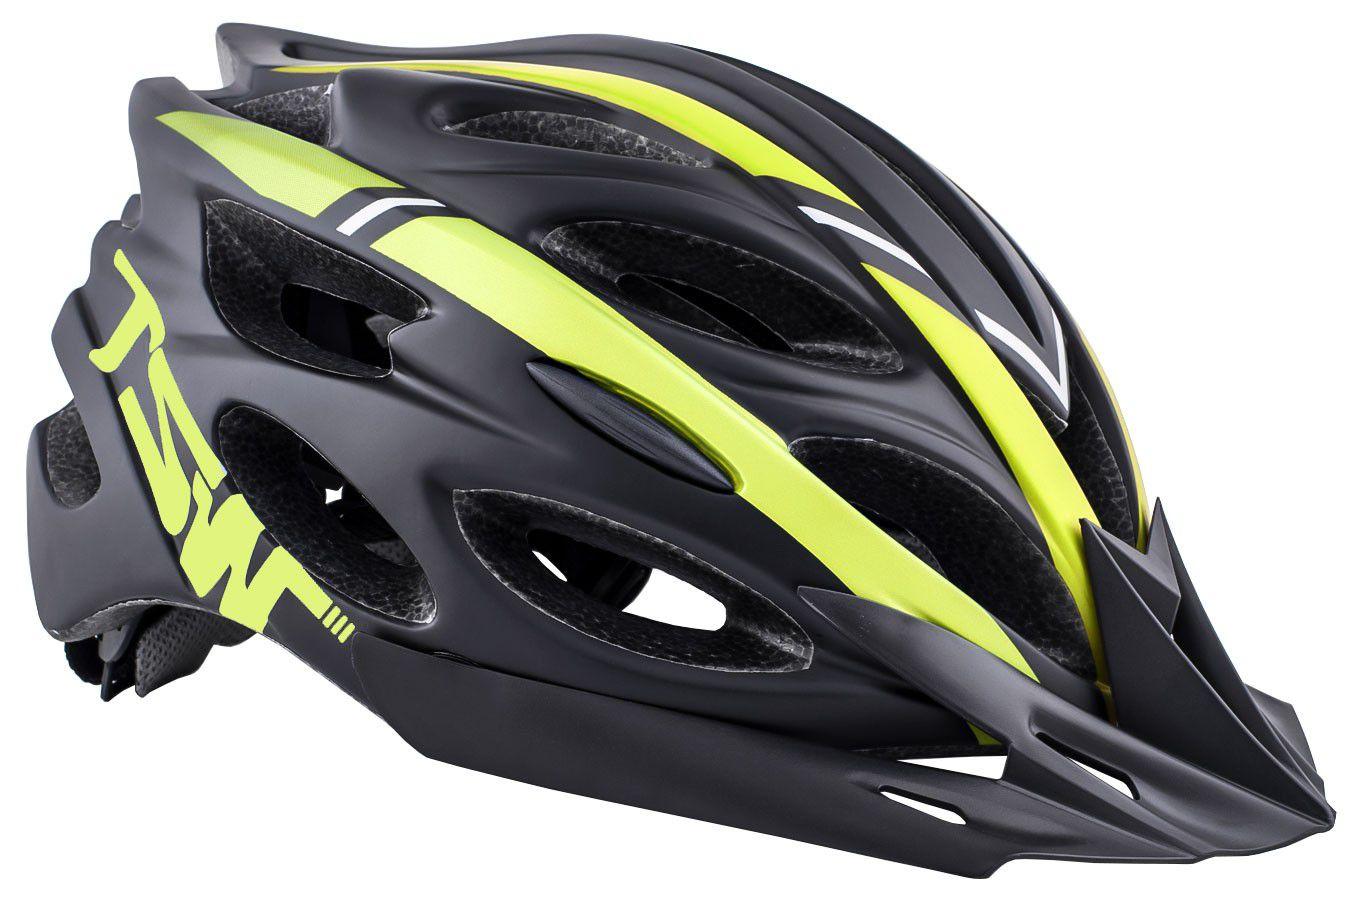 Capacete Ciclismo MTB Tune Preto/Vermelho/Azul - TSW